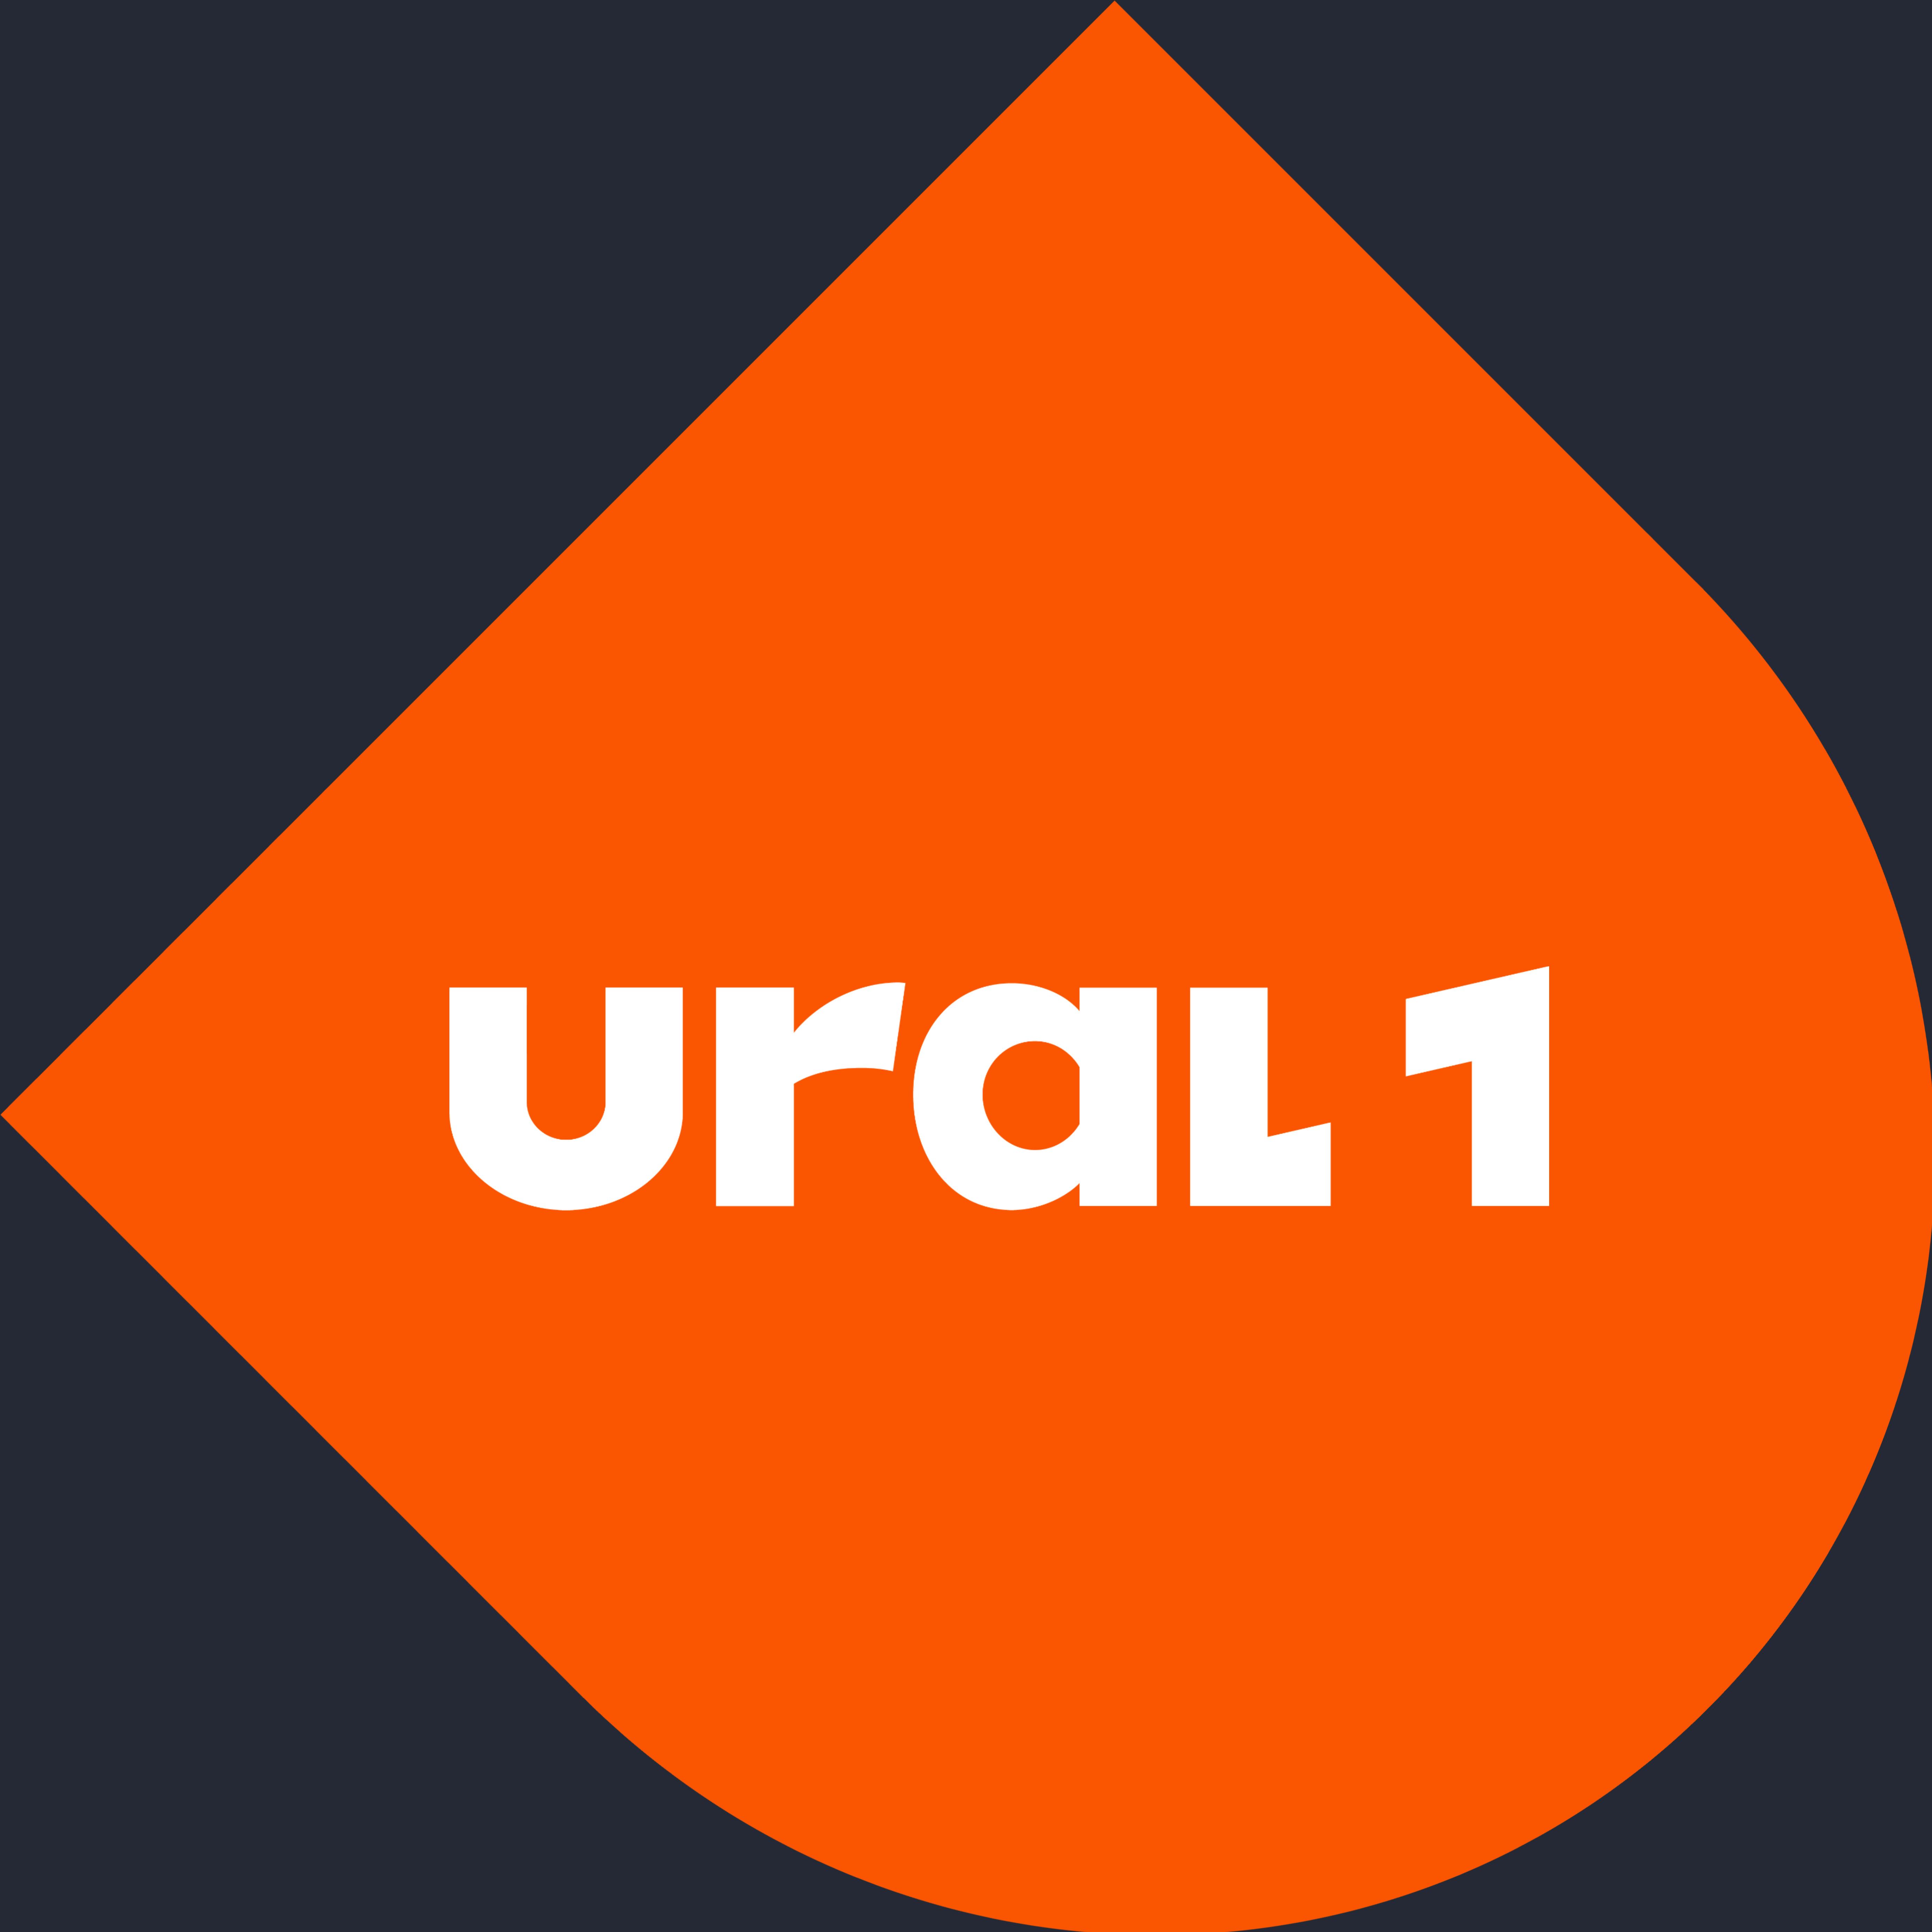 URAL1 (Челябинск)